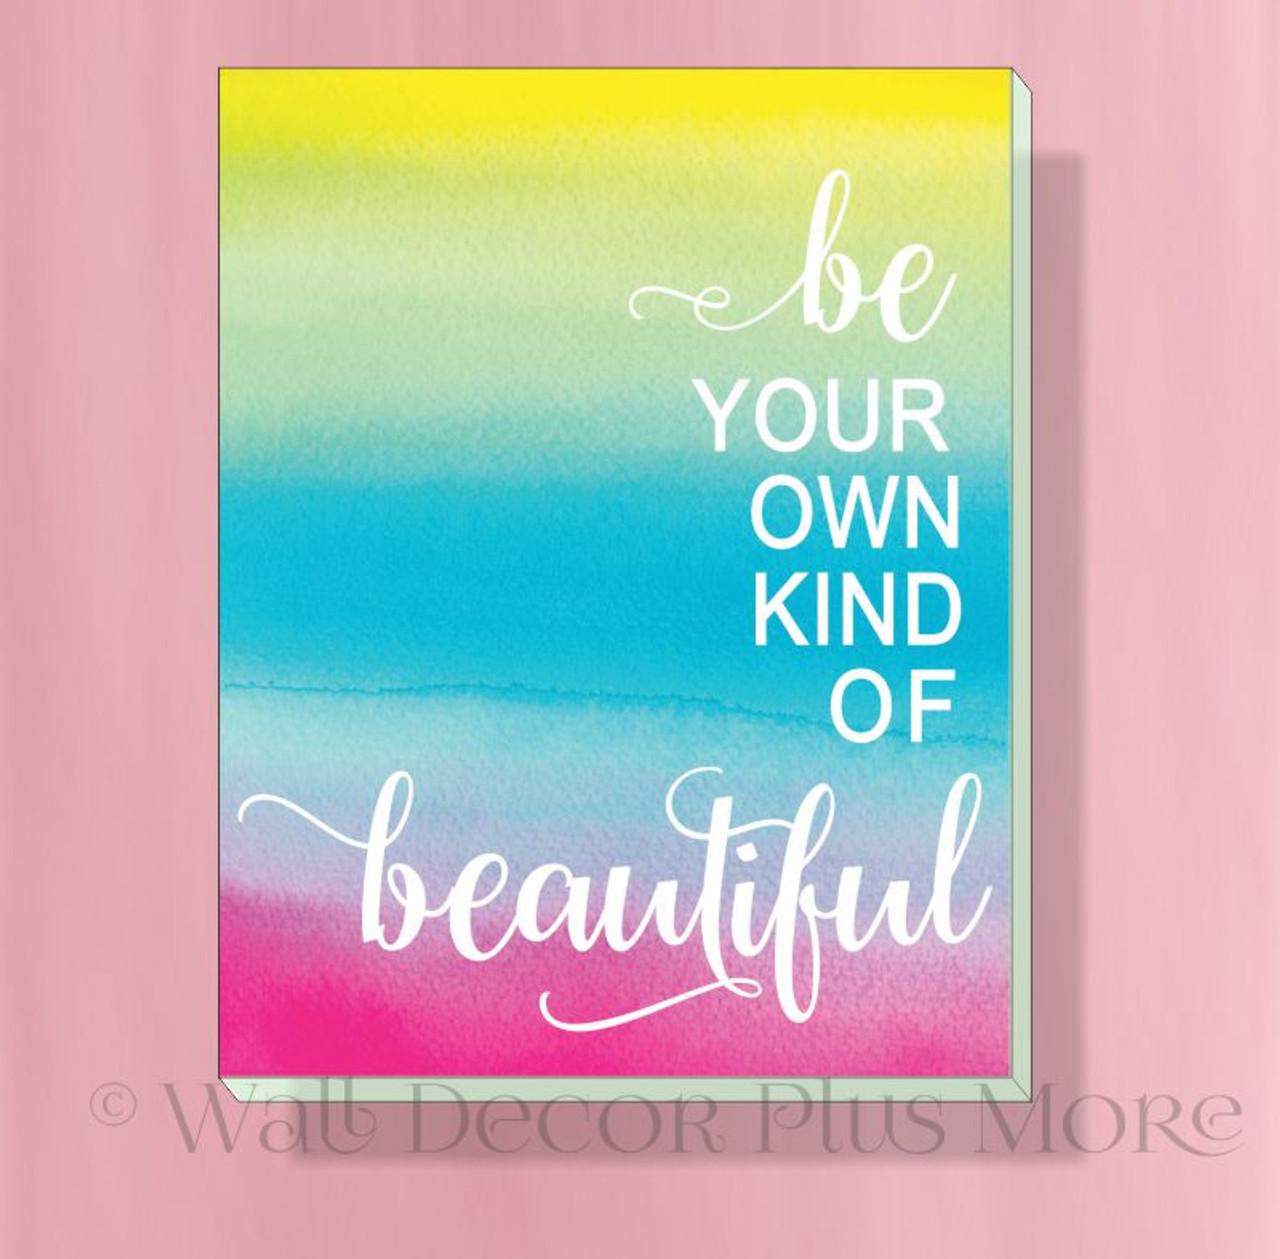 Be Beautiful 12x14 Lighweight Motivational Canvas Print Girl Bedroom Wall Decor